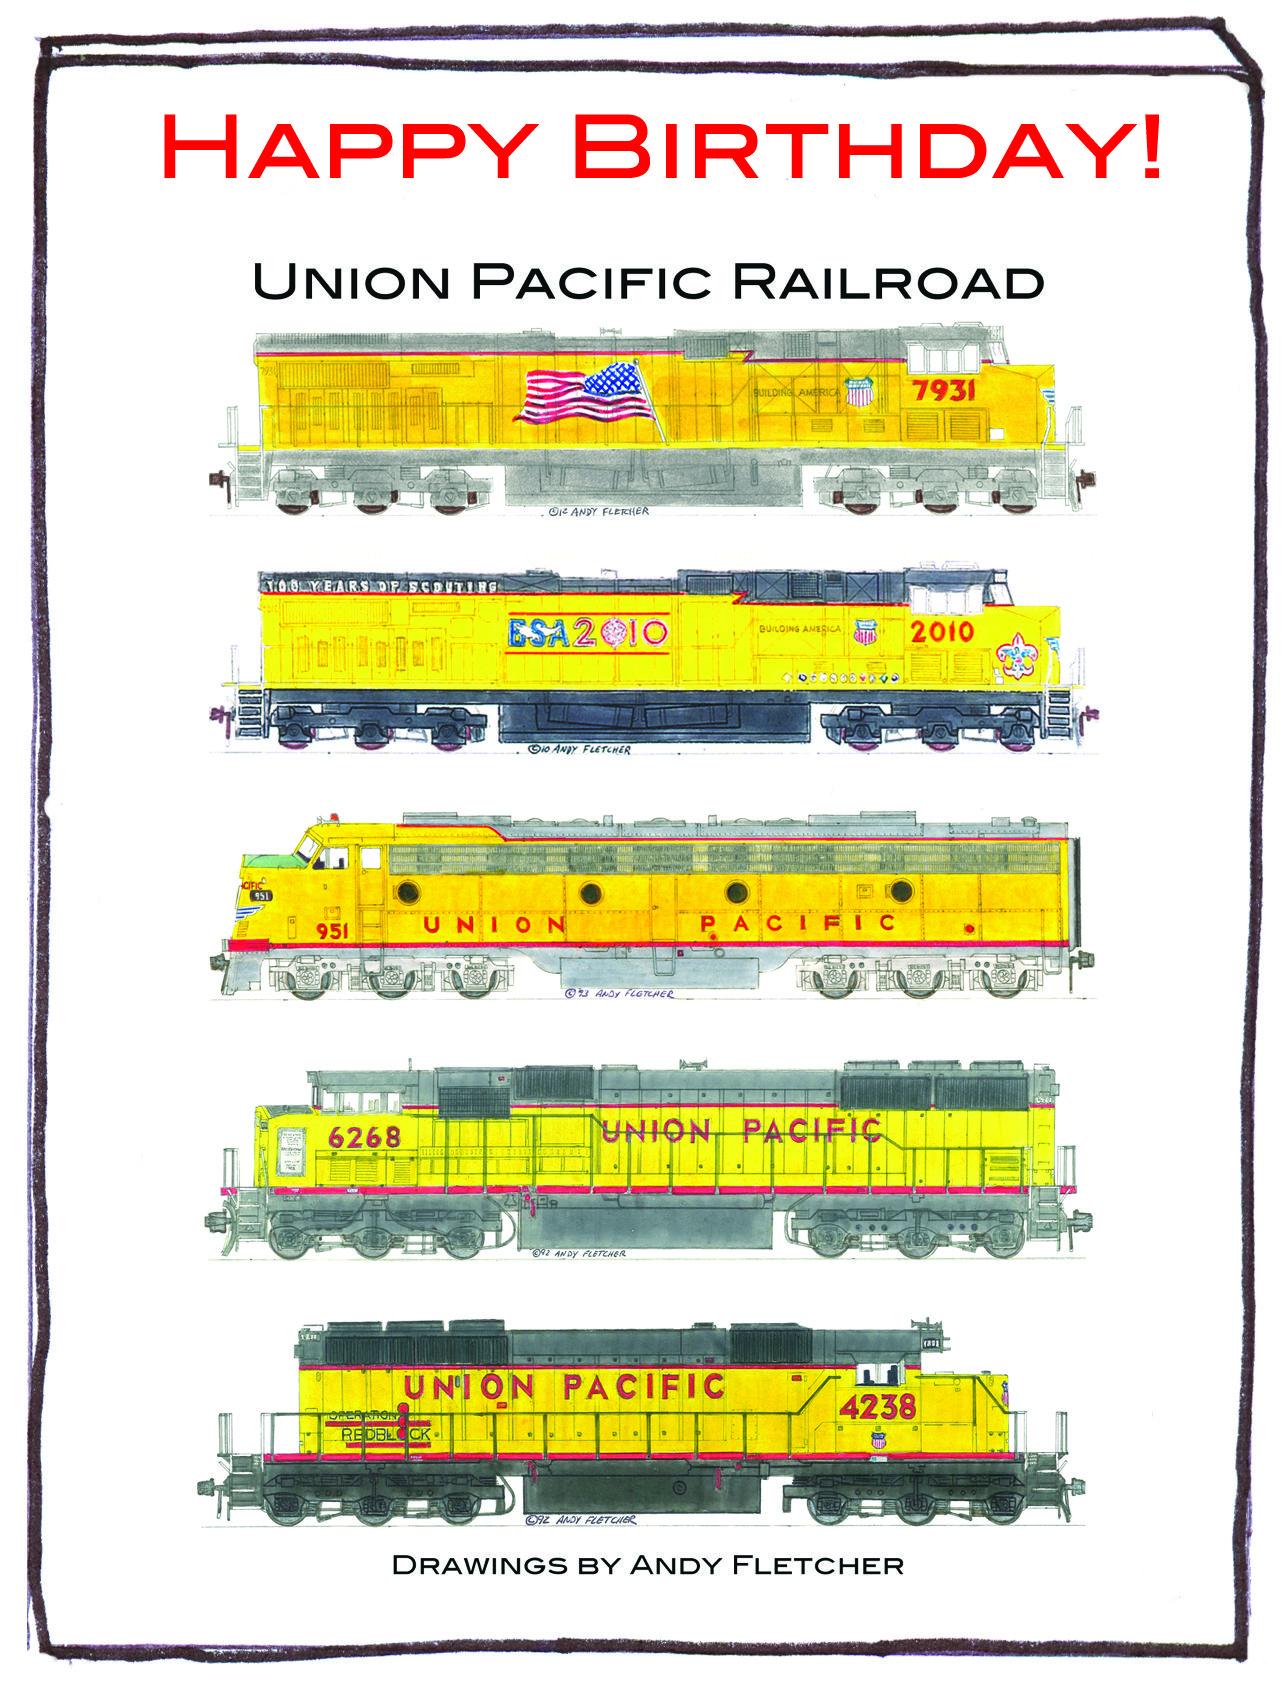 Birthday Postcards For Union Pacific Railroad Fans Train